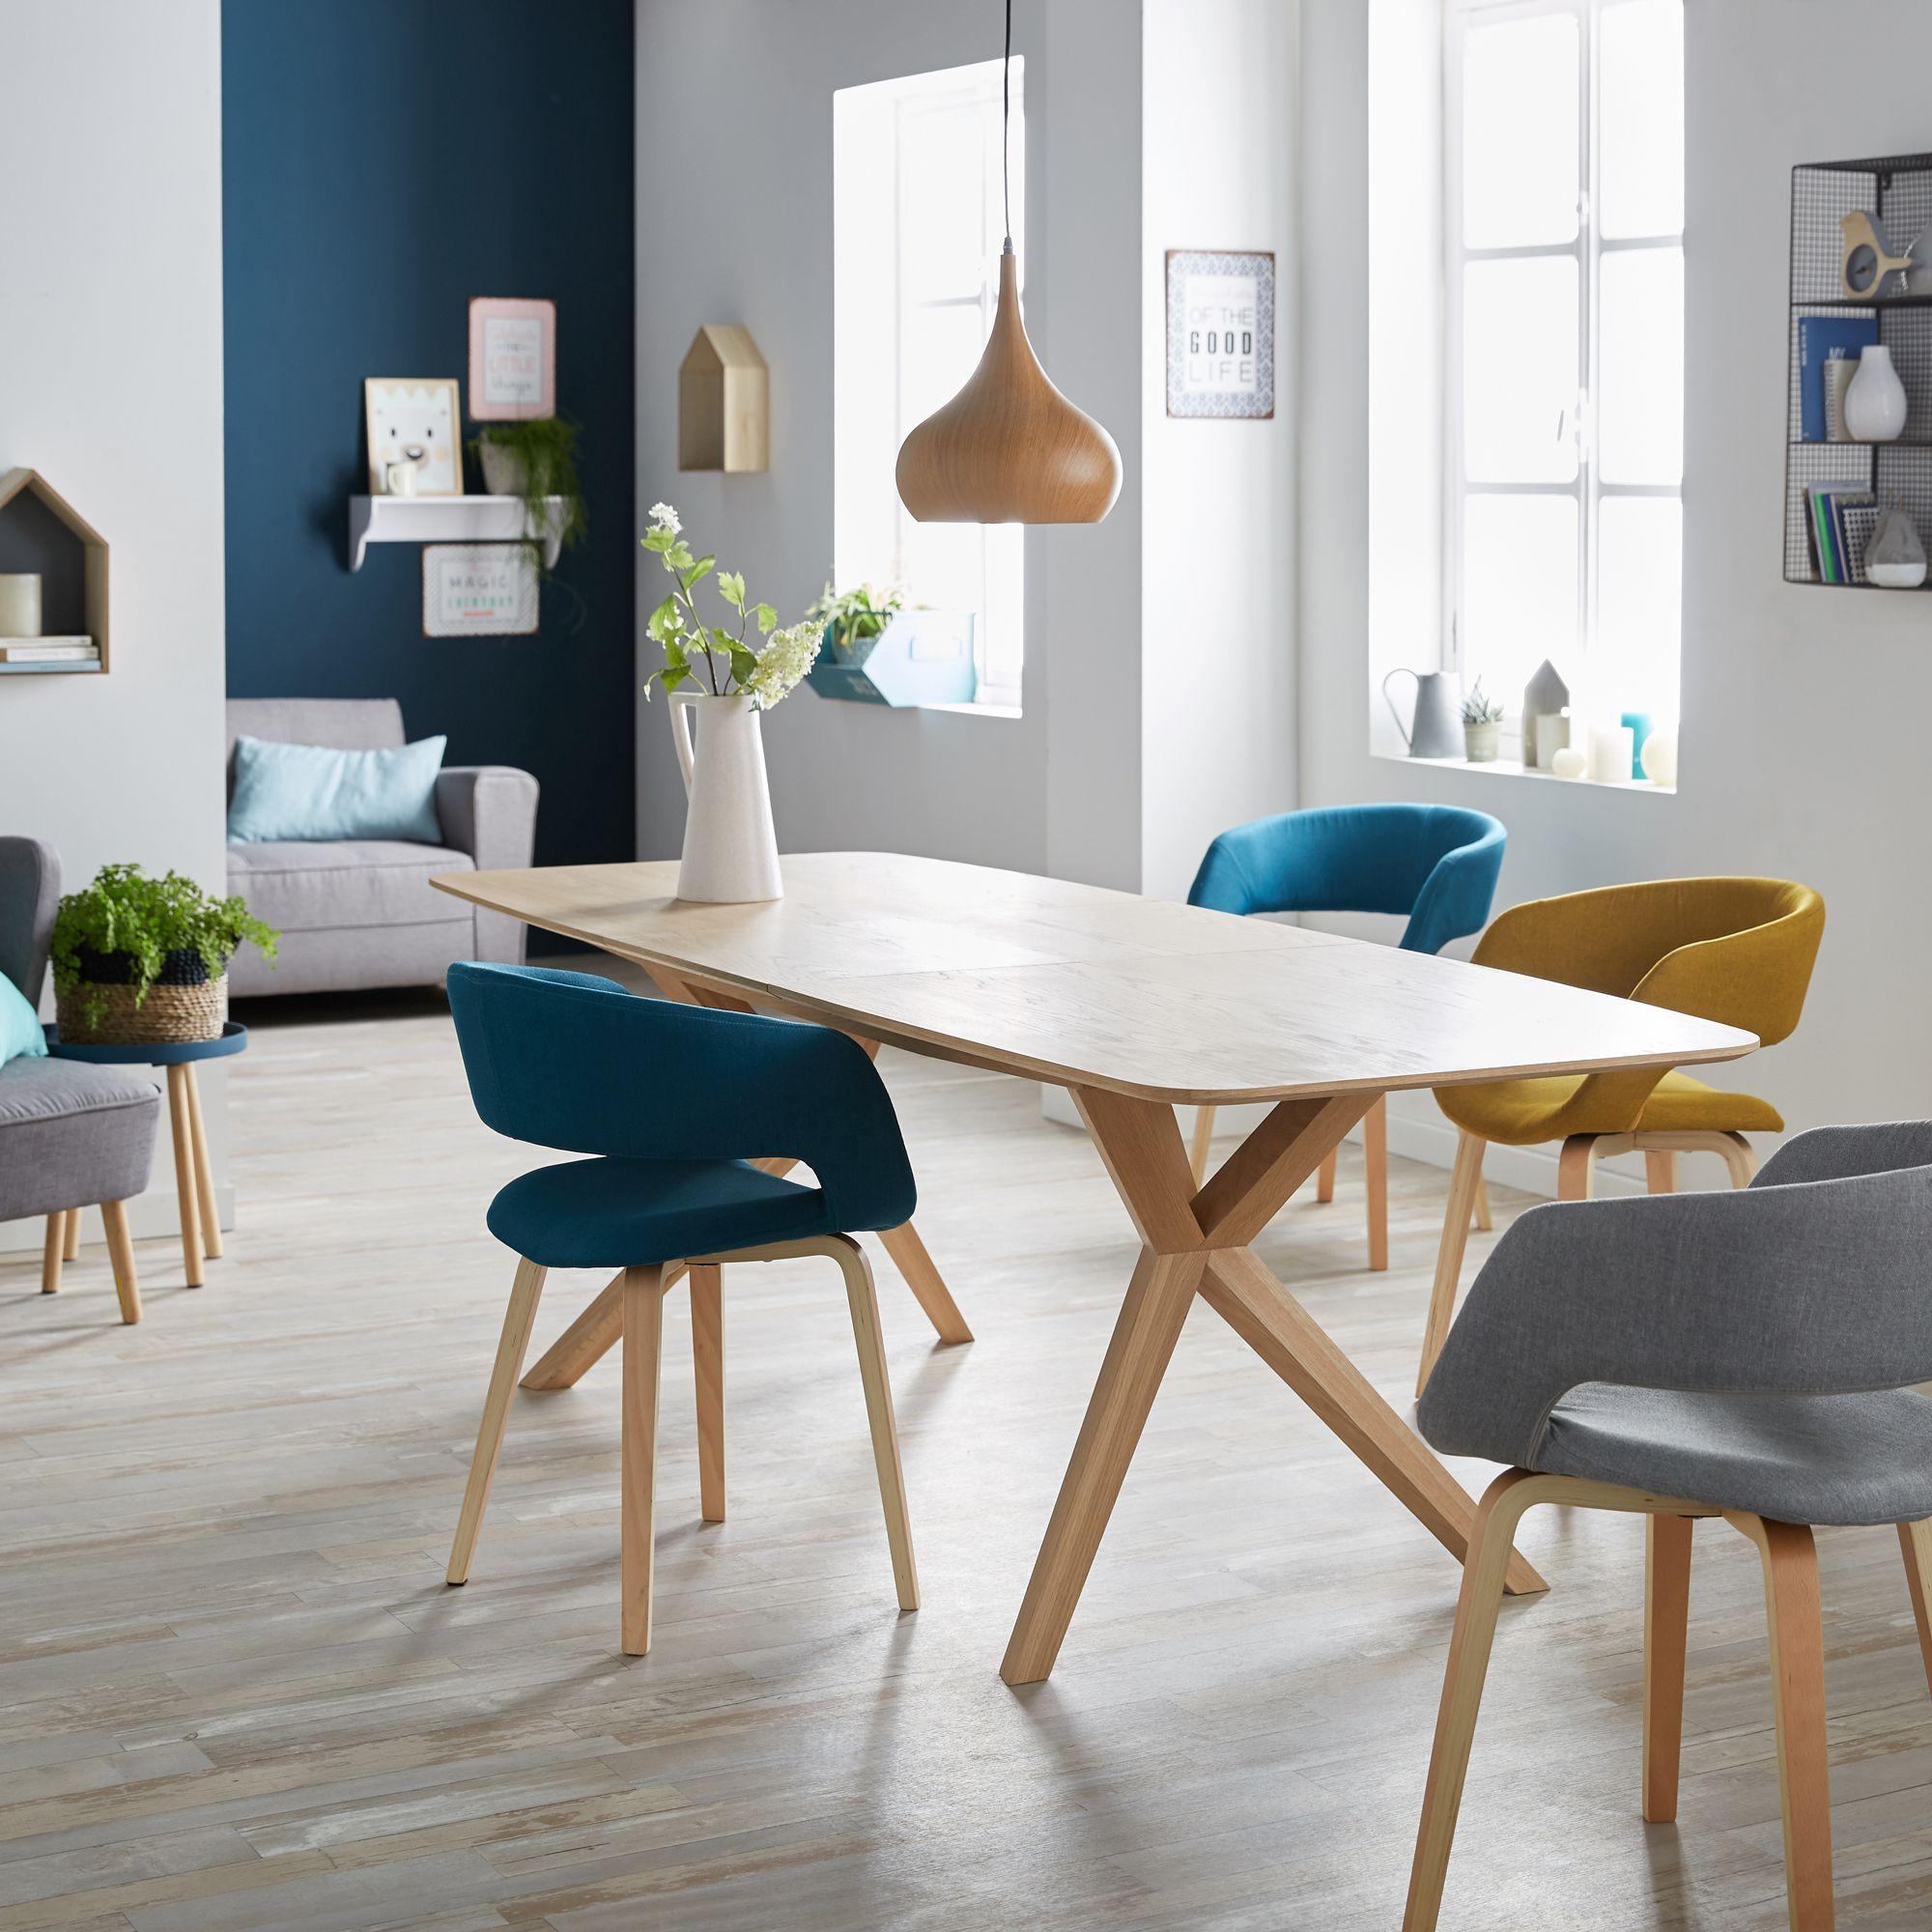 Alinea : Joyau Chaise Avec Accoudoirs Bleu - #alinea tout Chaise